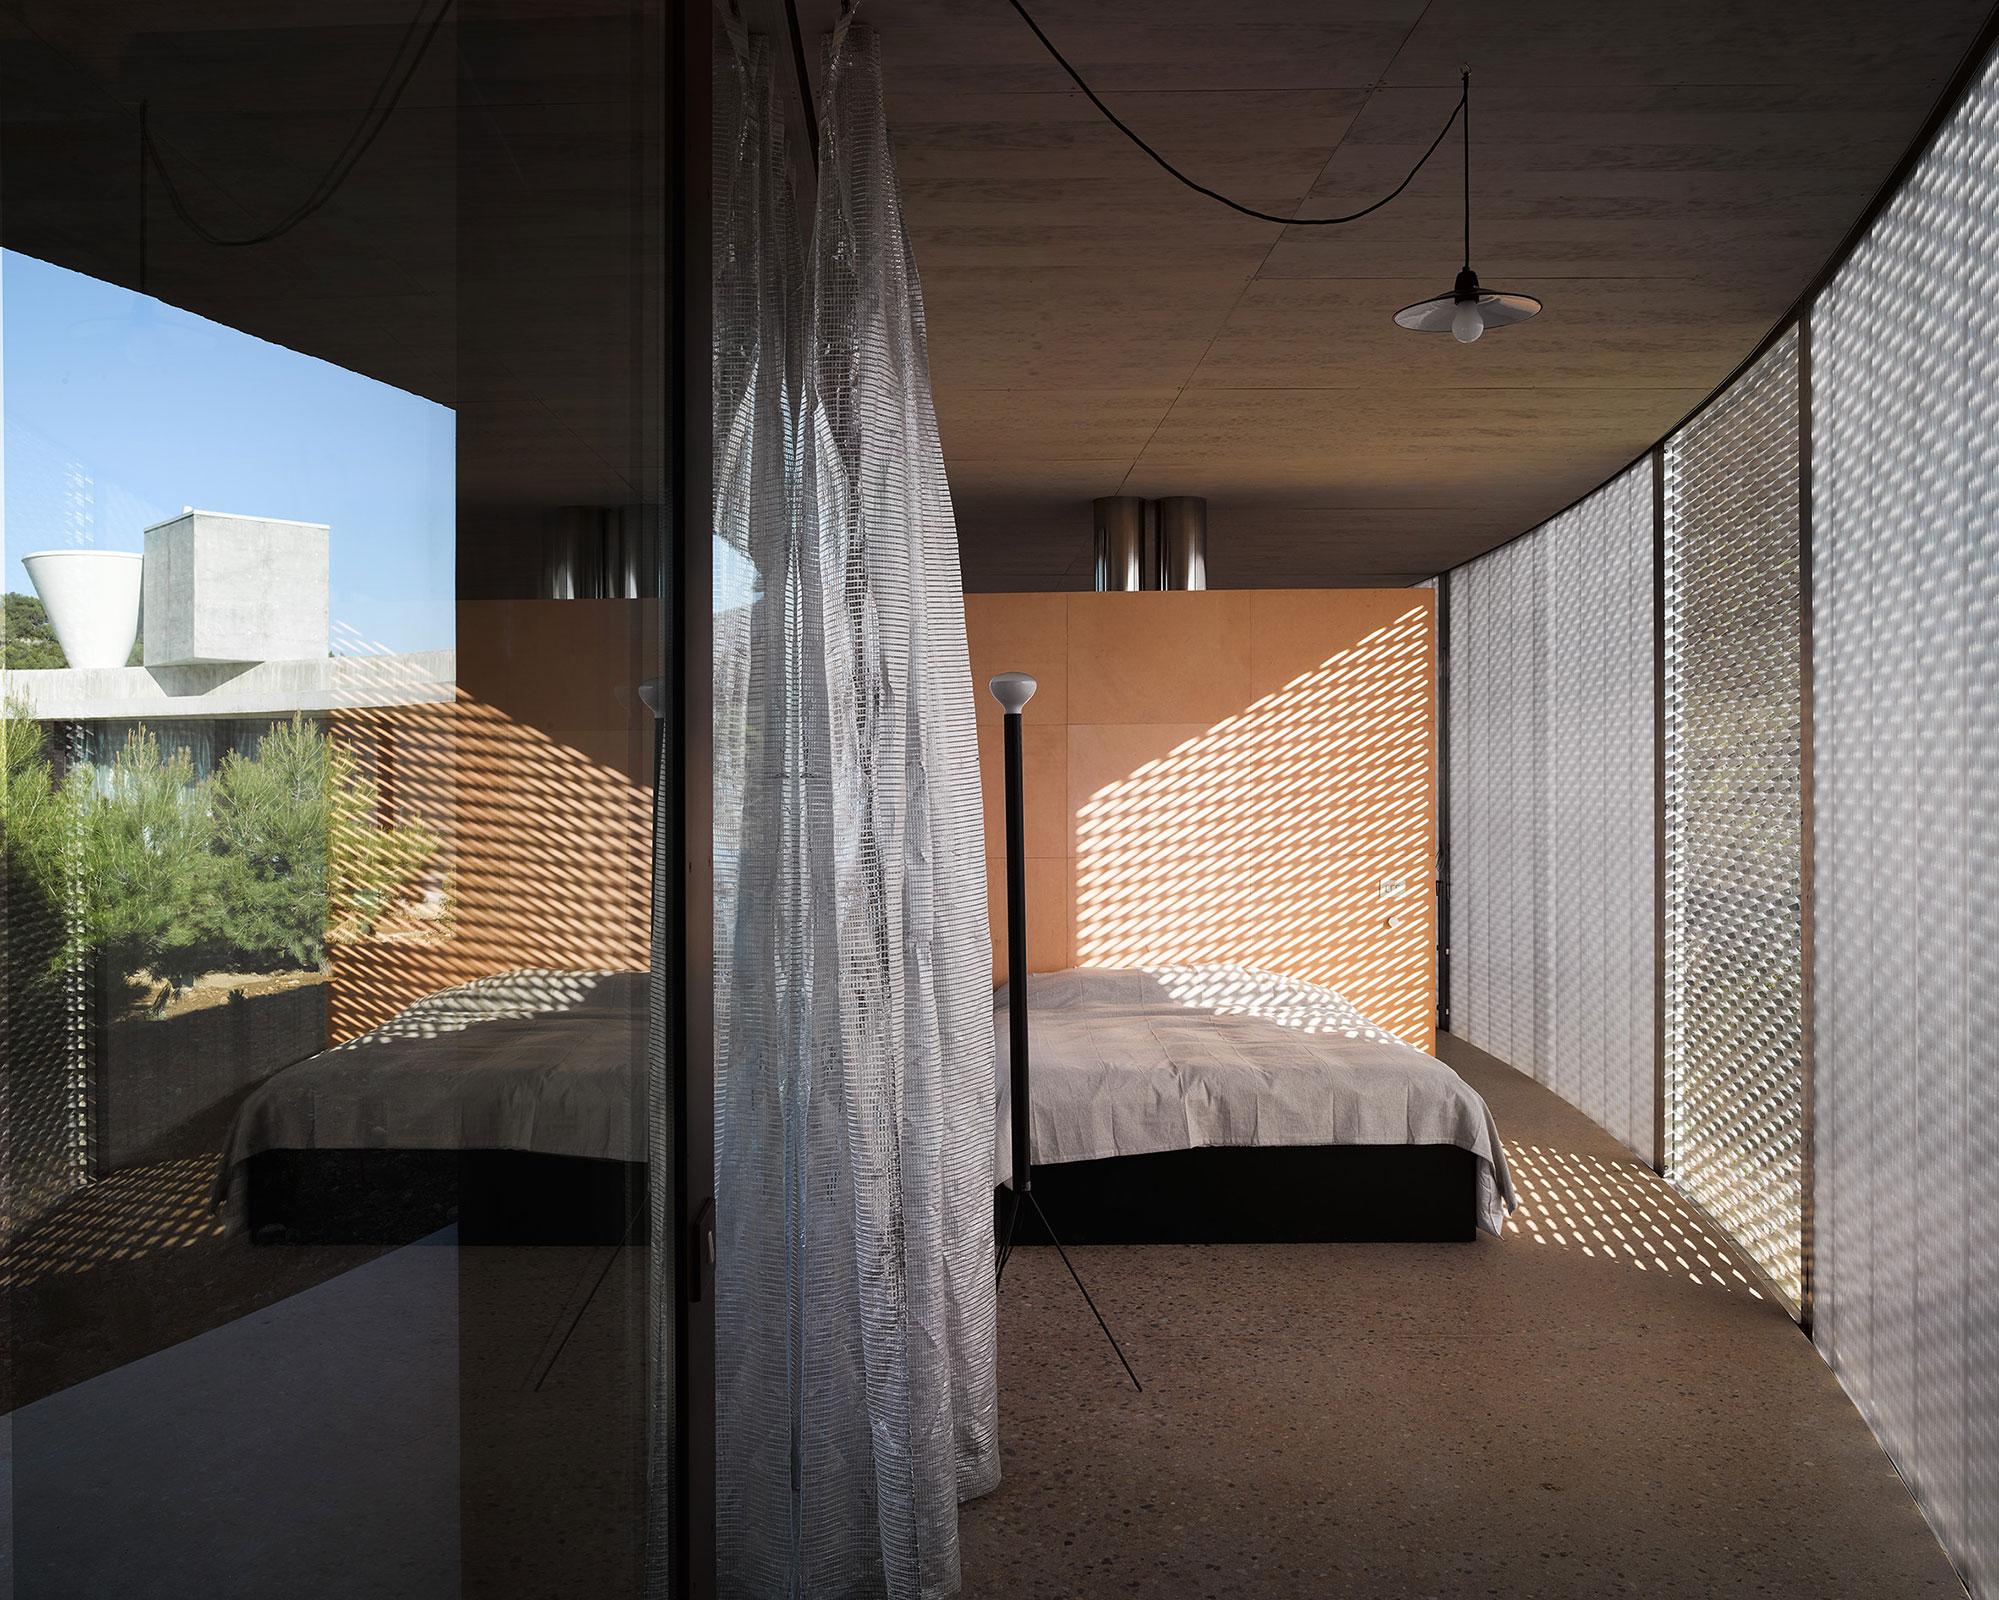 5. Solo House II by Office KGDVS in Matarraña Teruel - Solo House II by Office KGDVS encircles forested hilltop in Matarraña, Teruel